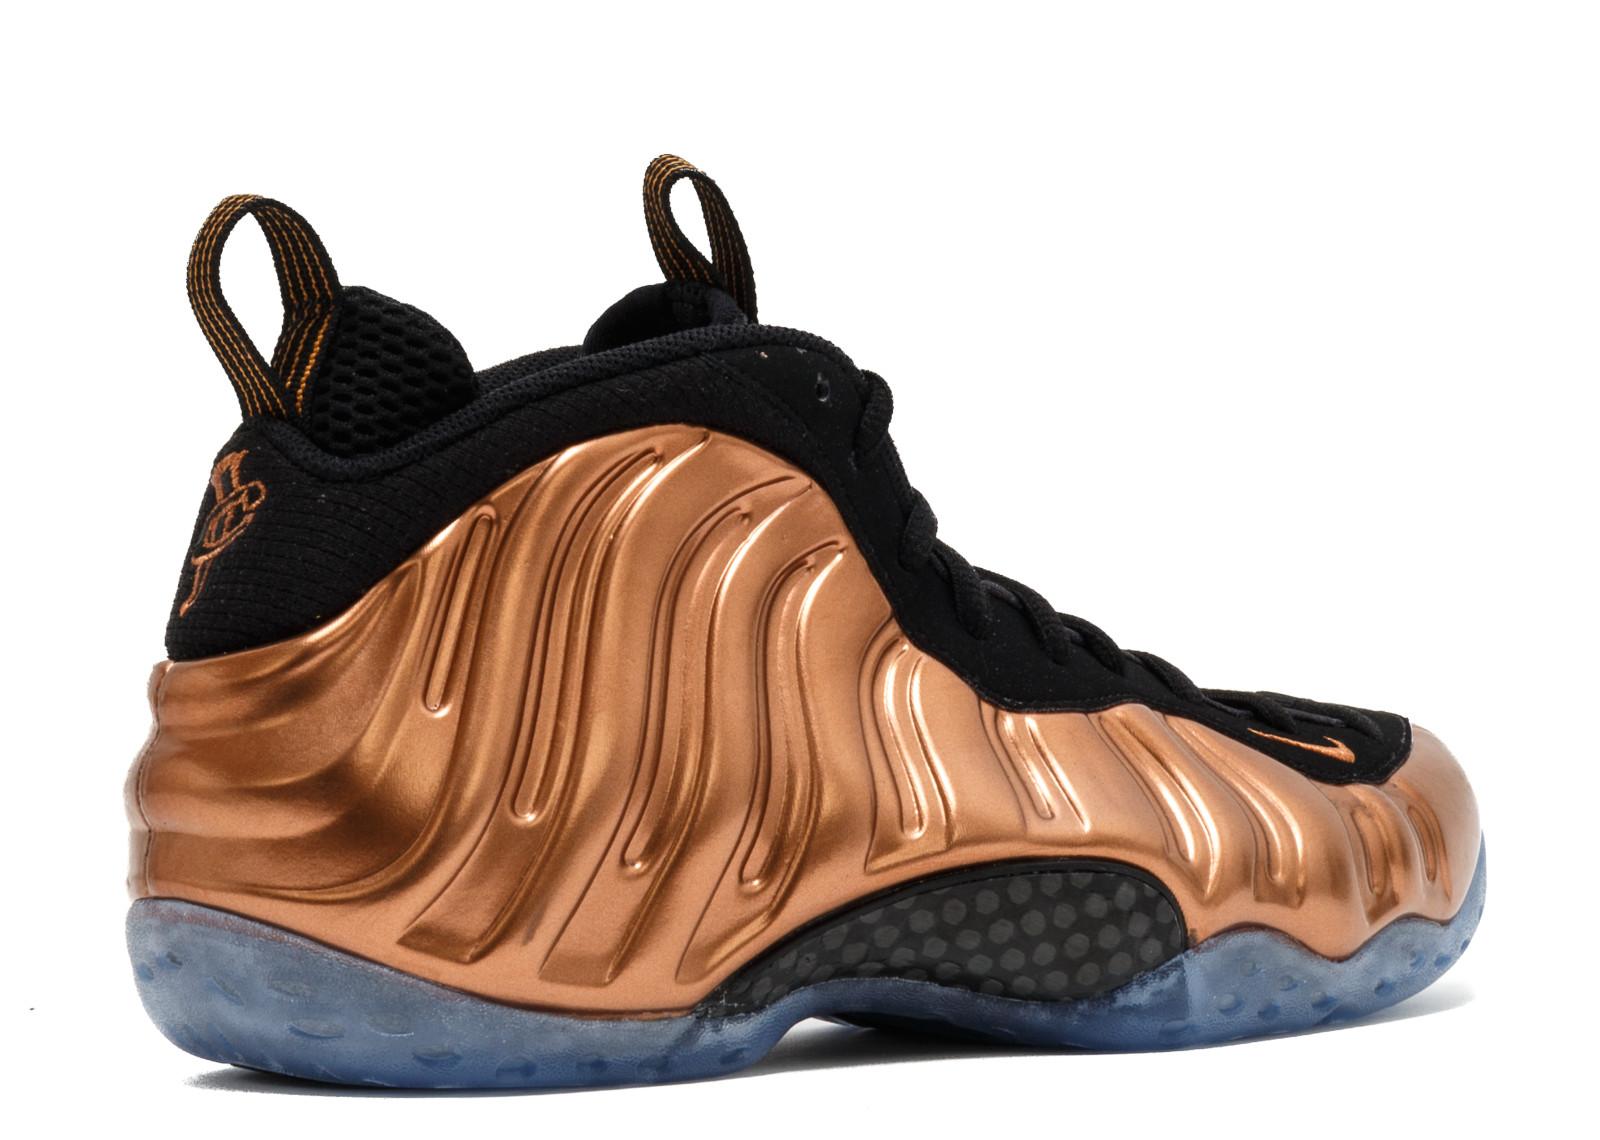 pretty nice ccb14 f642f Mens Nike Air Foamposite One Copper Black Metallic Copper 314996-007 ...